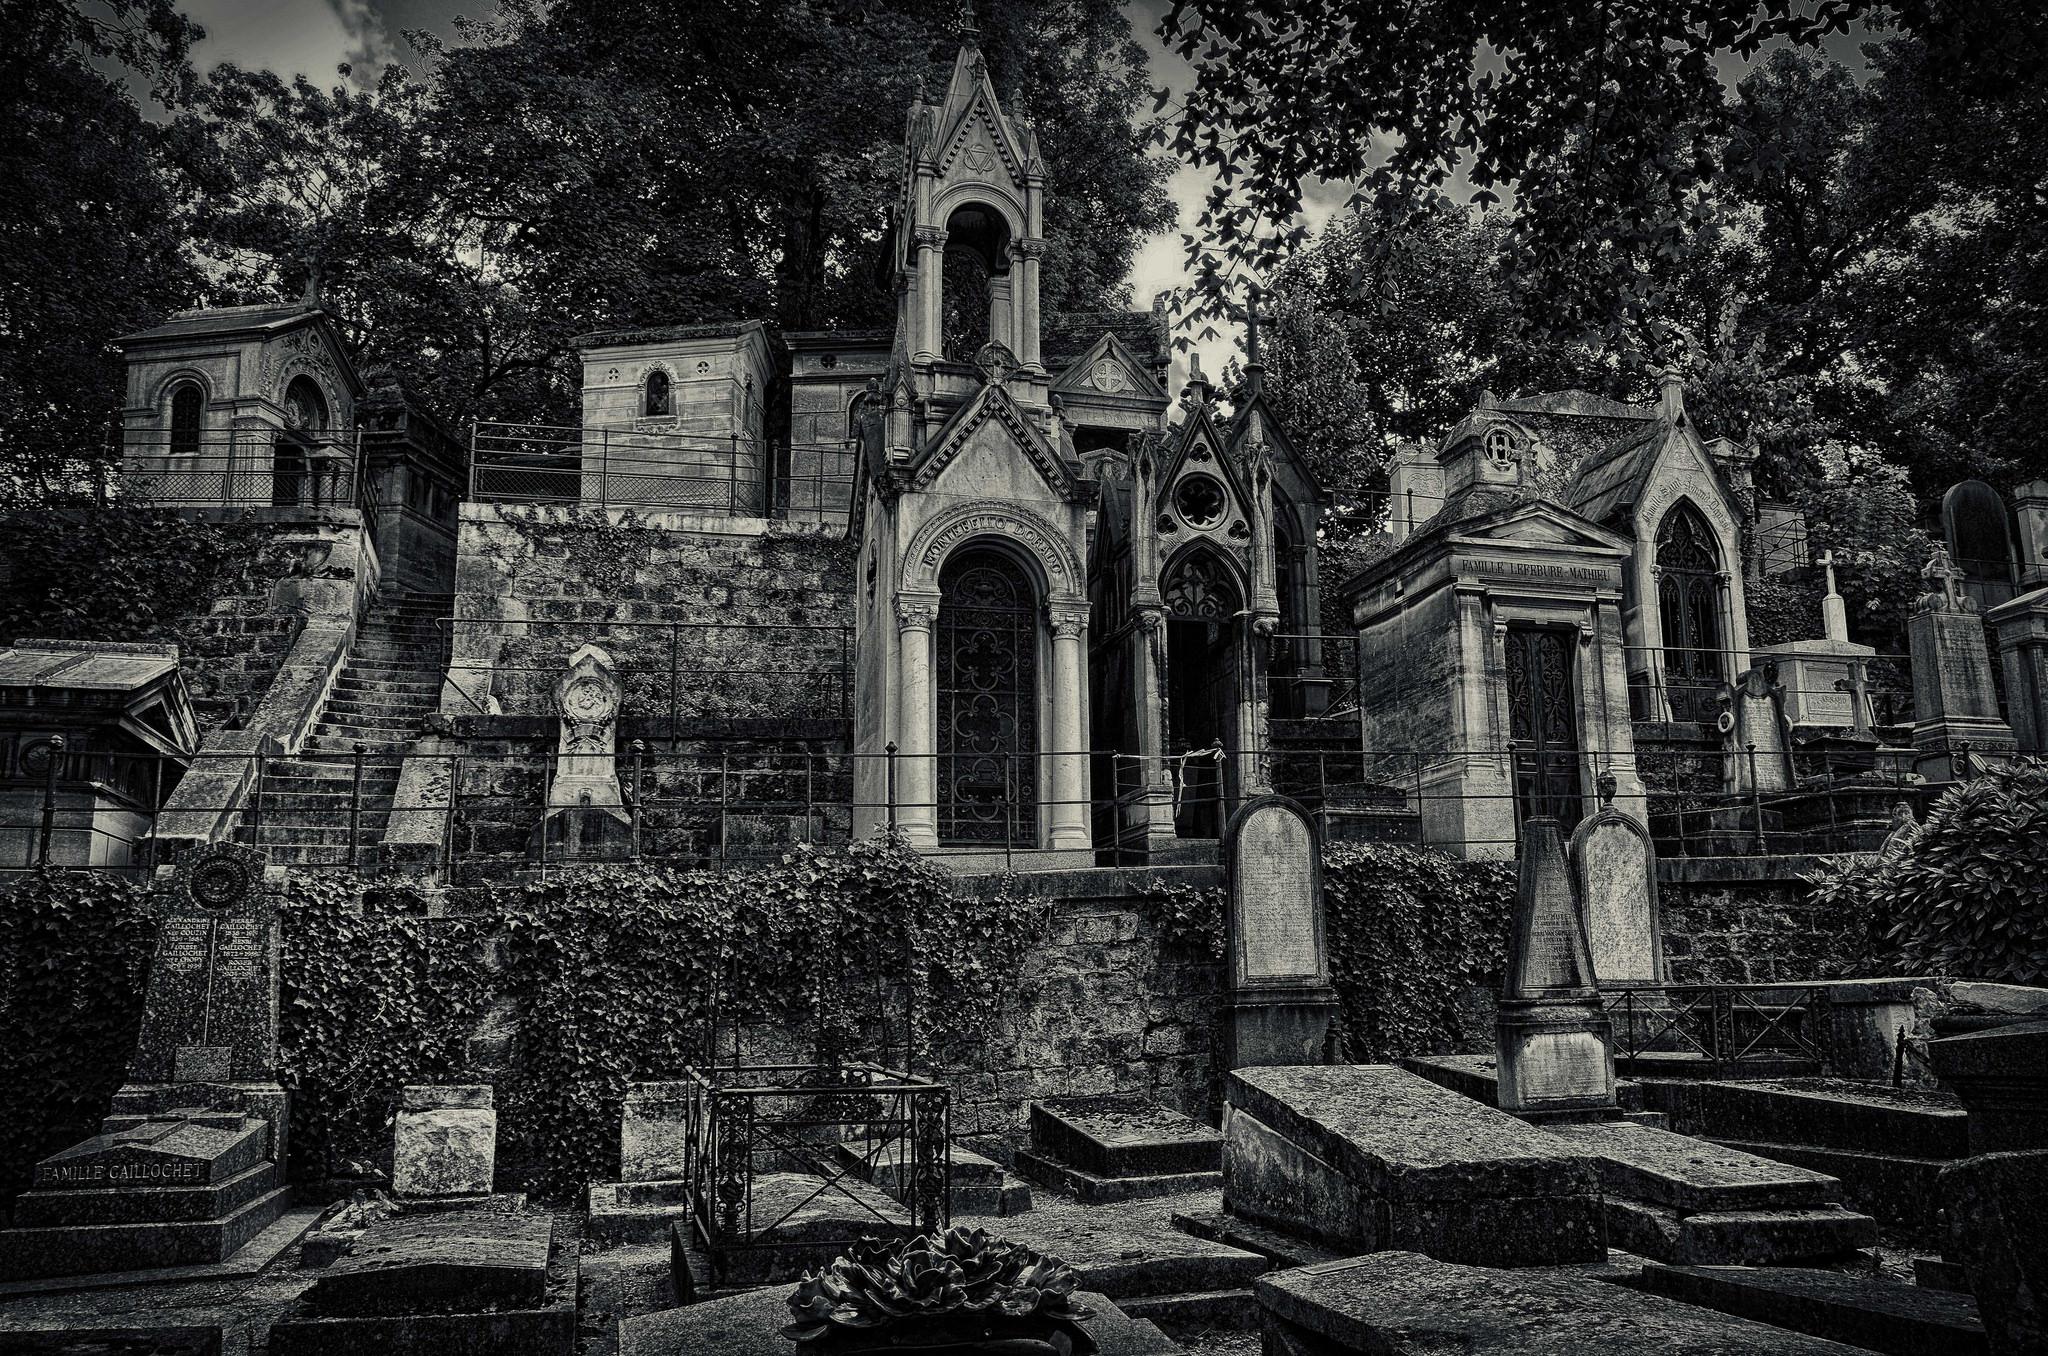 Cemitério sinistro